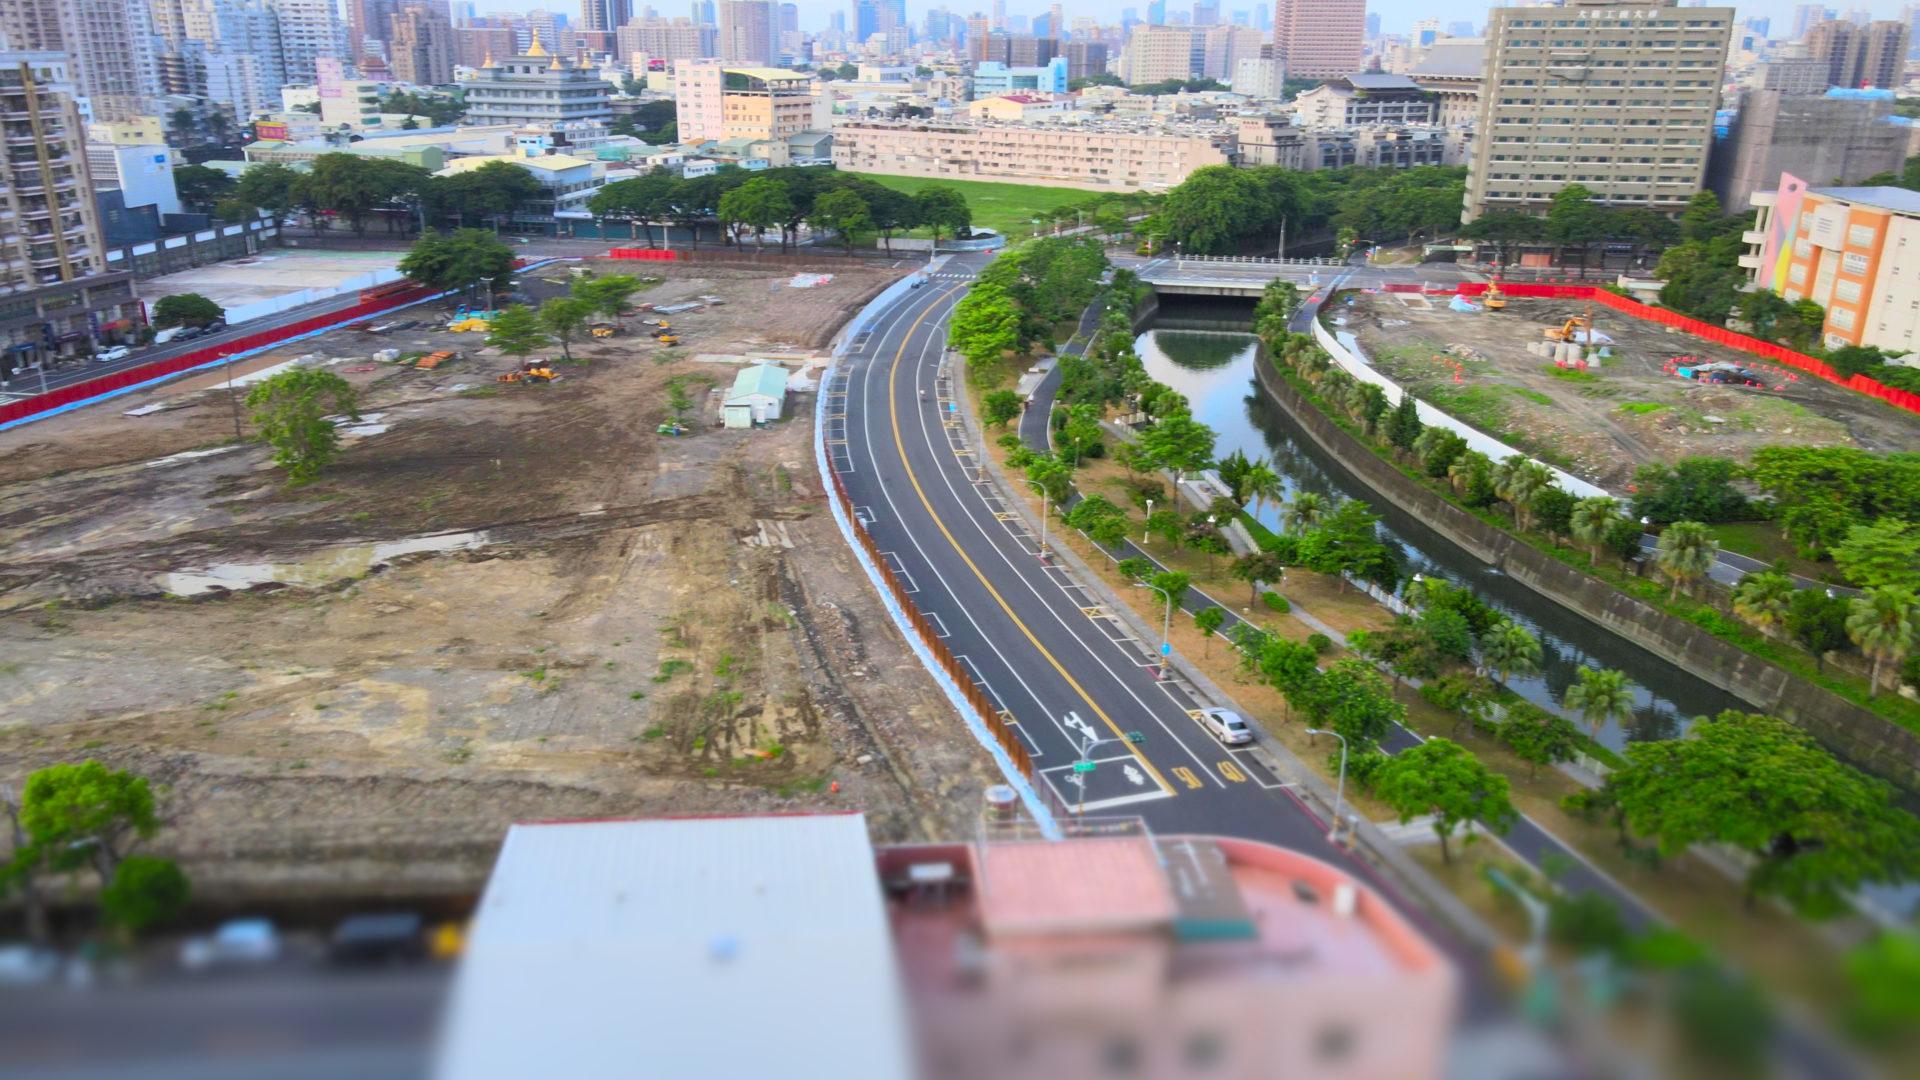 Urban Development Love River/Dashun Rd